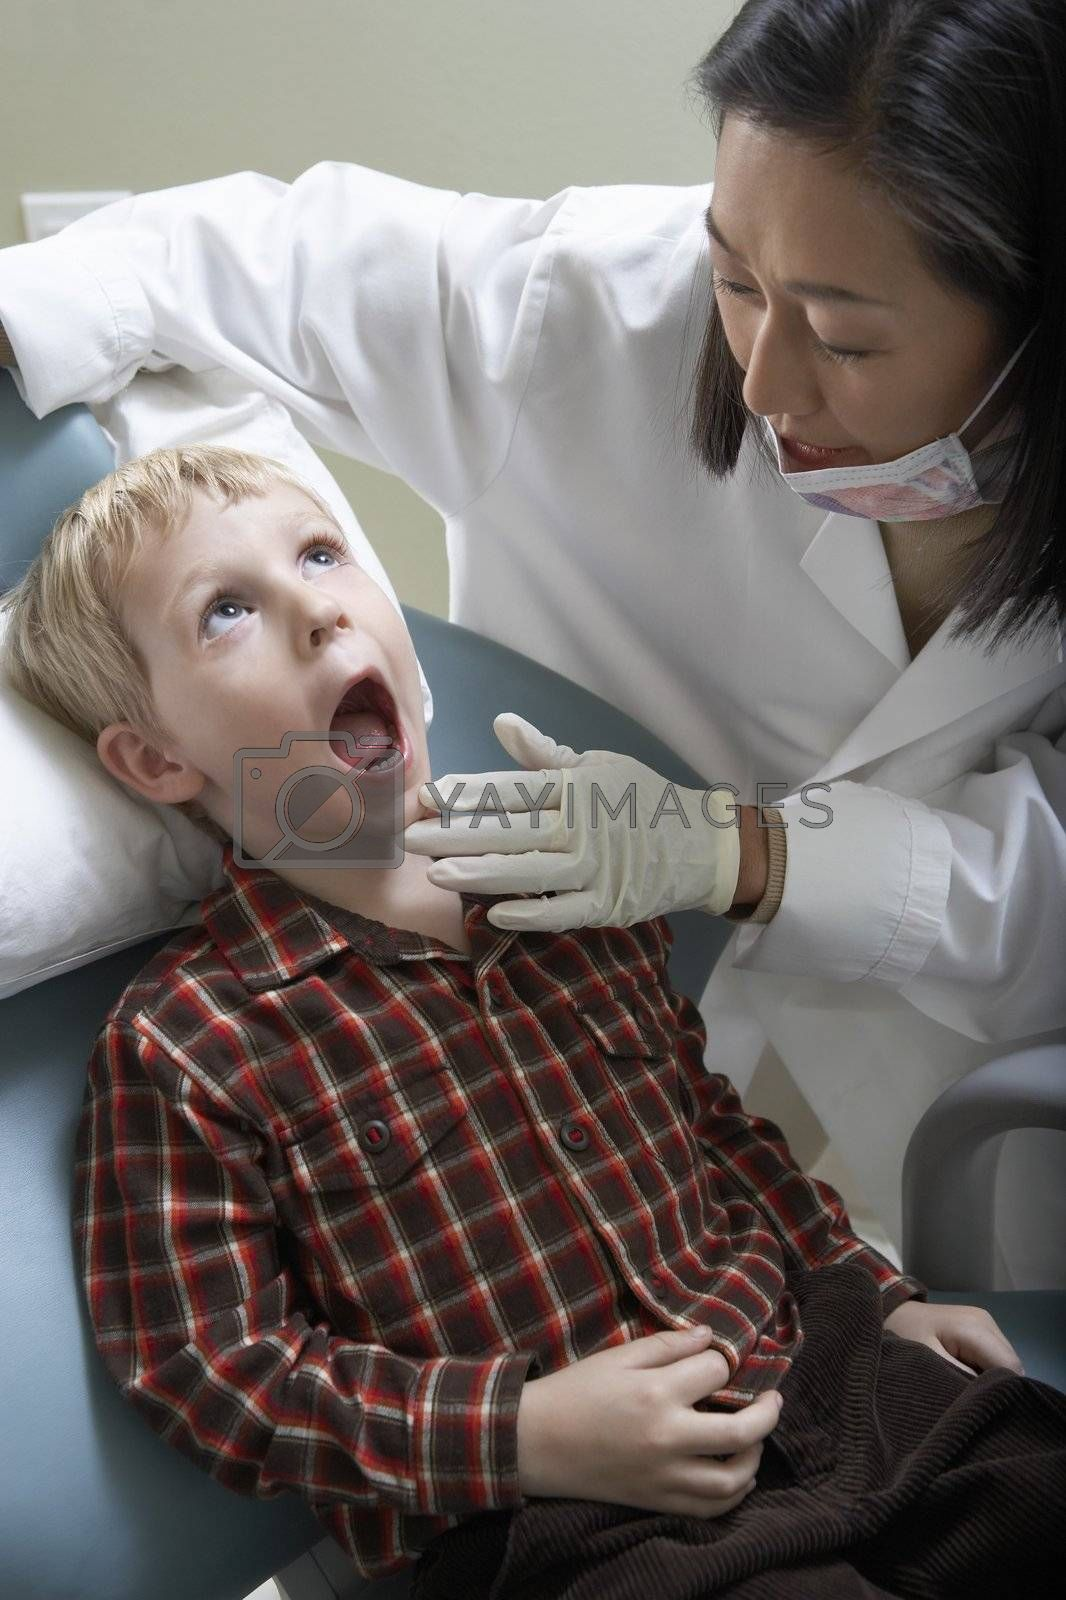 Boy at Dentist's Office